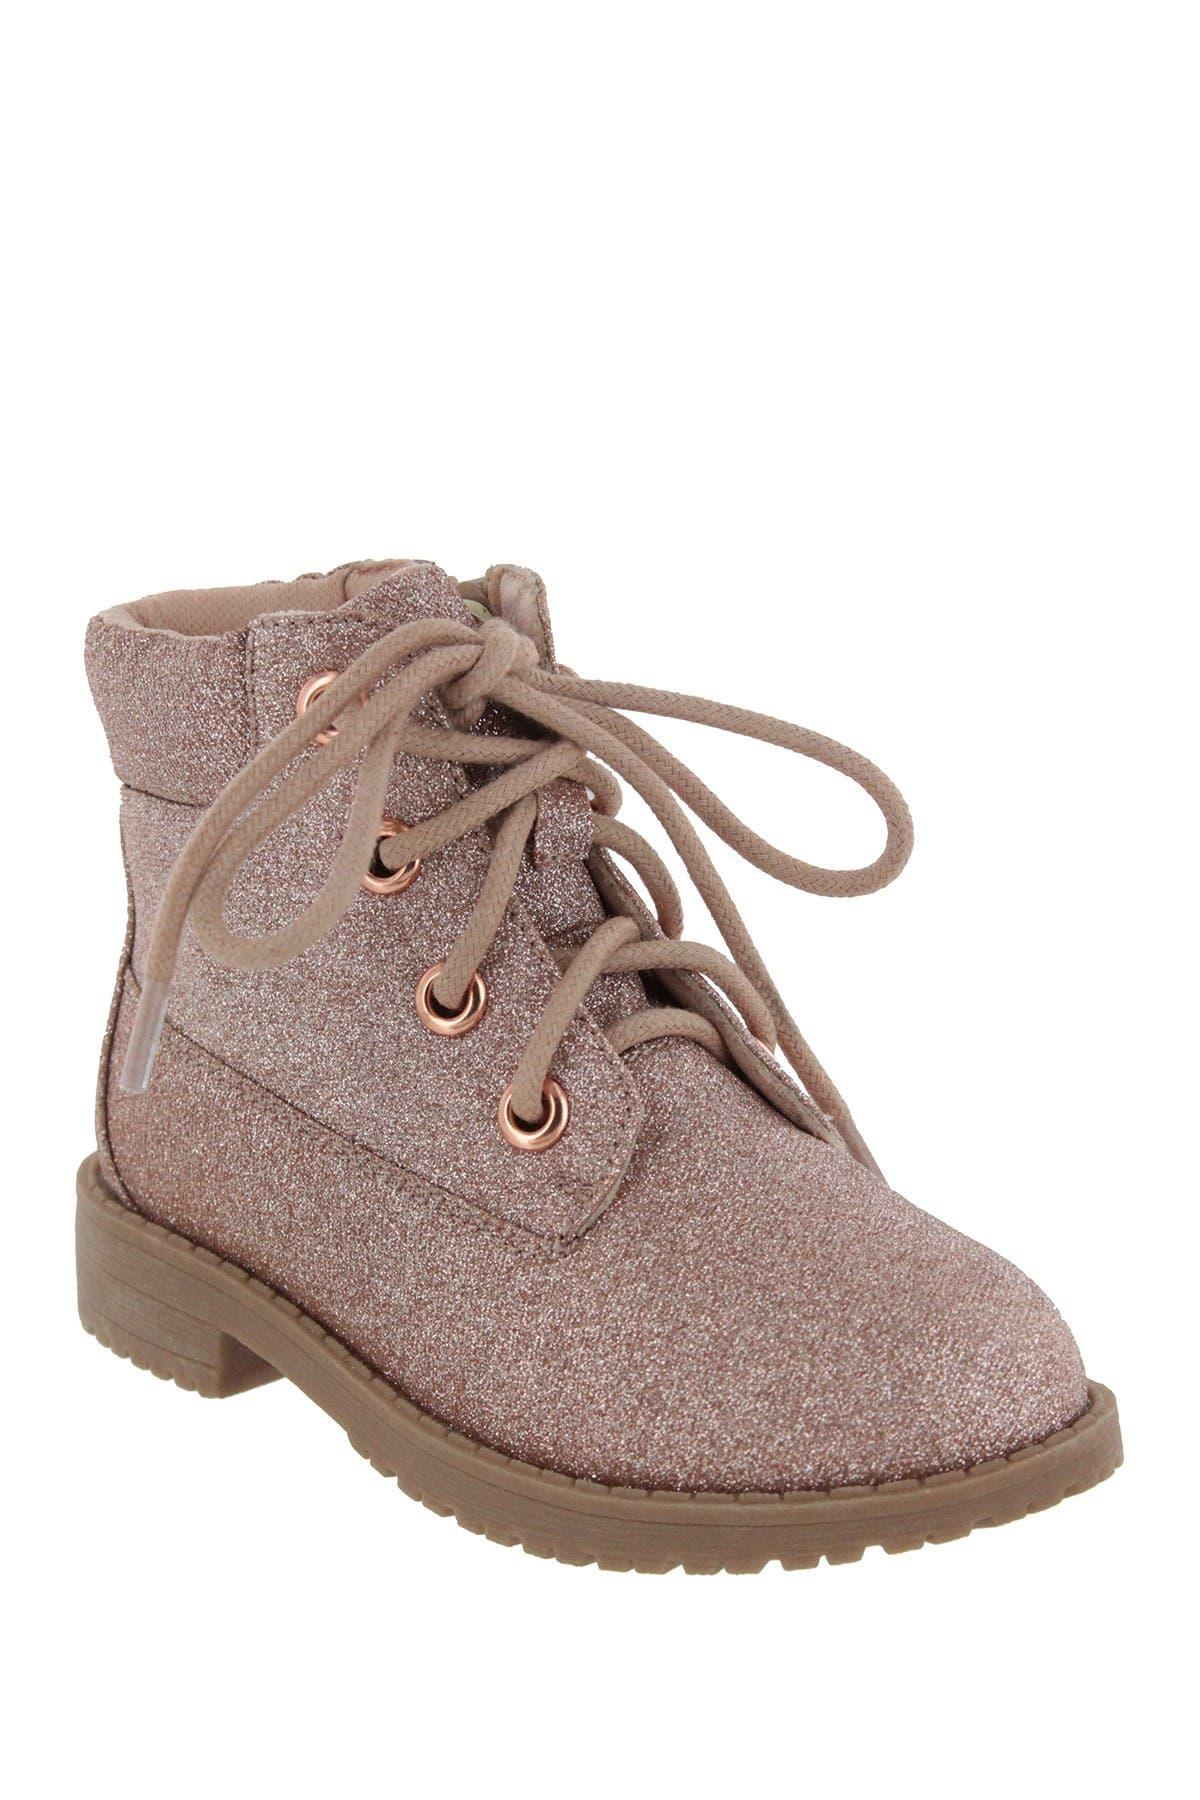 MIA Everly Glitter Boot